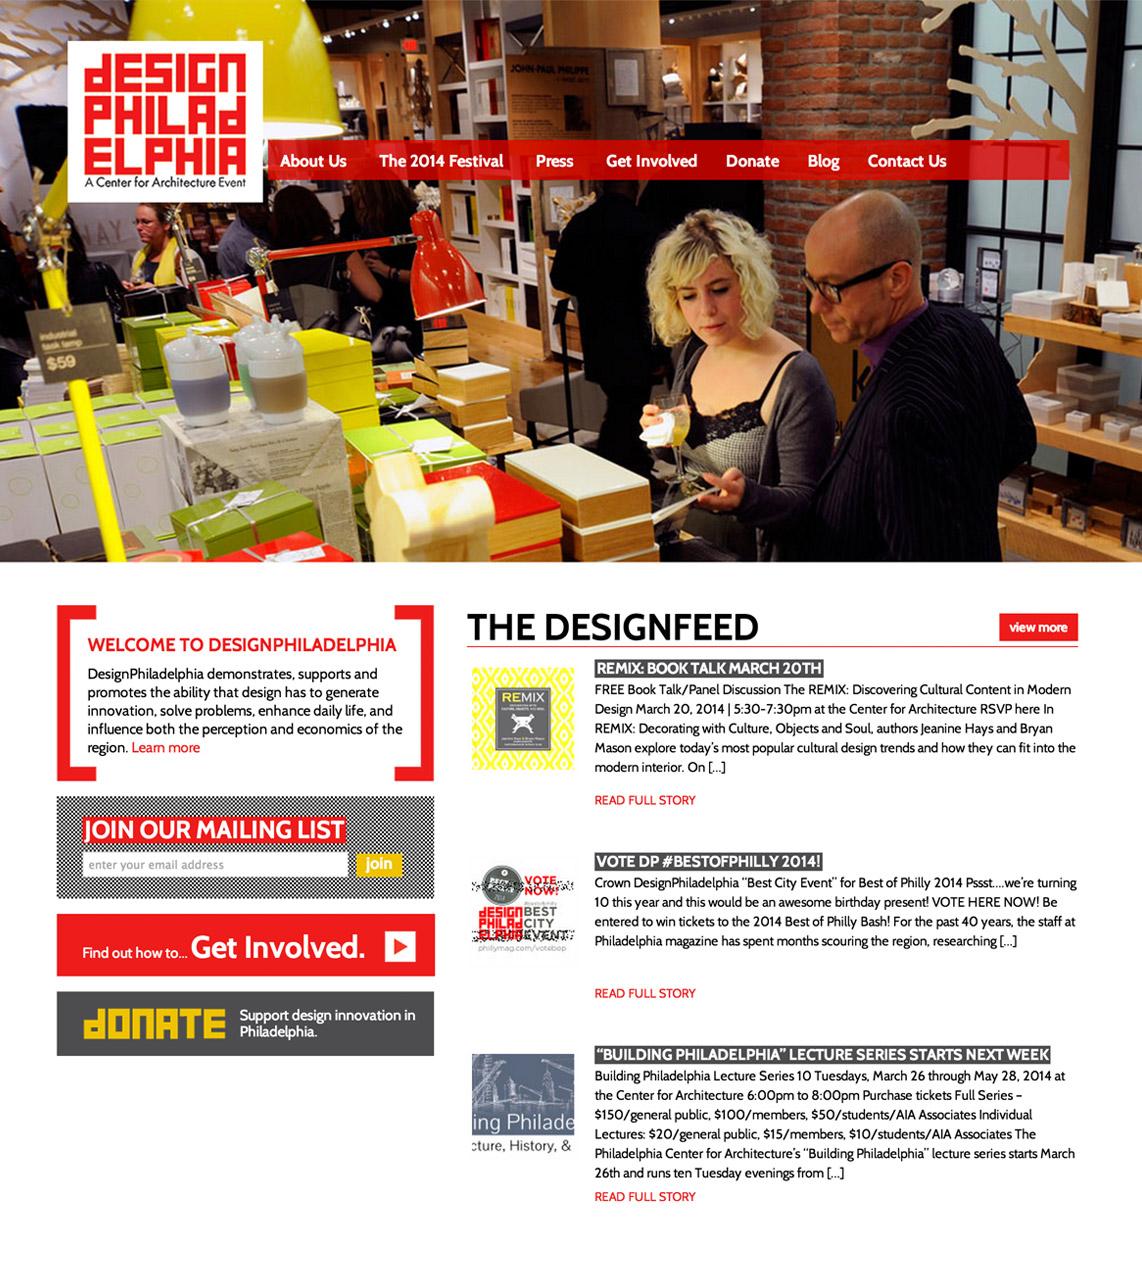 DesignPhiladelphia Website Design